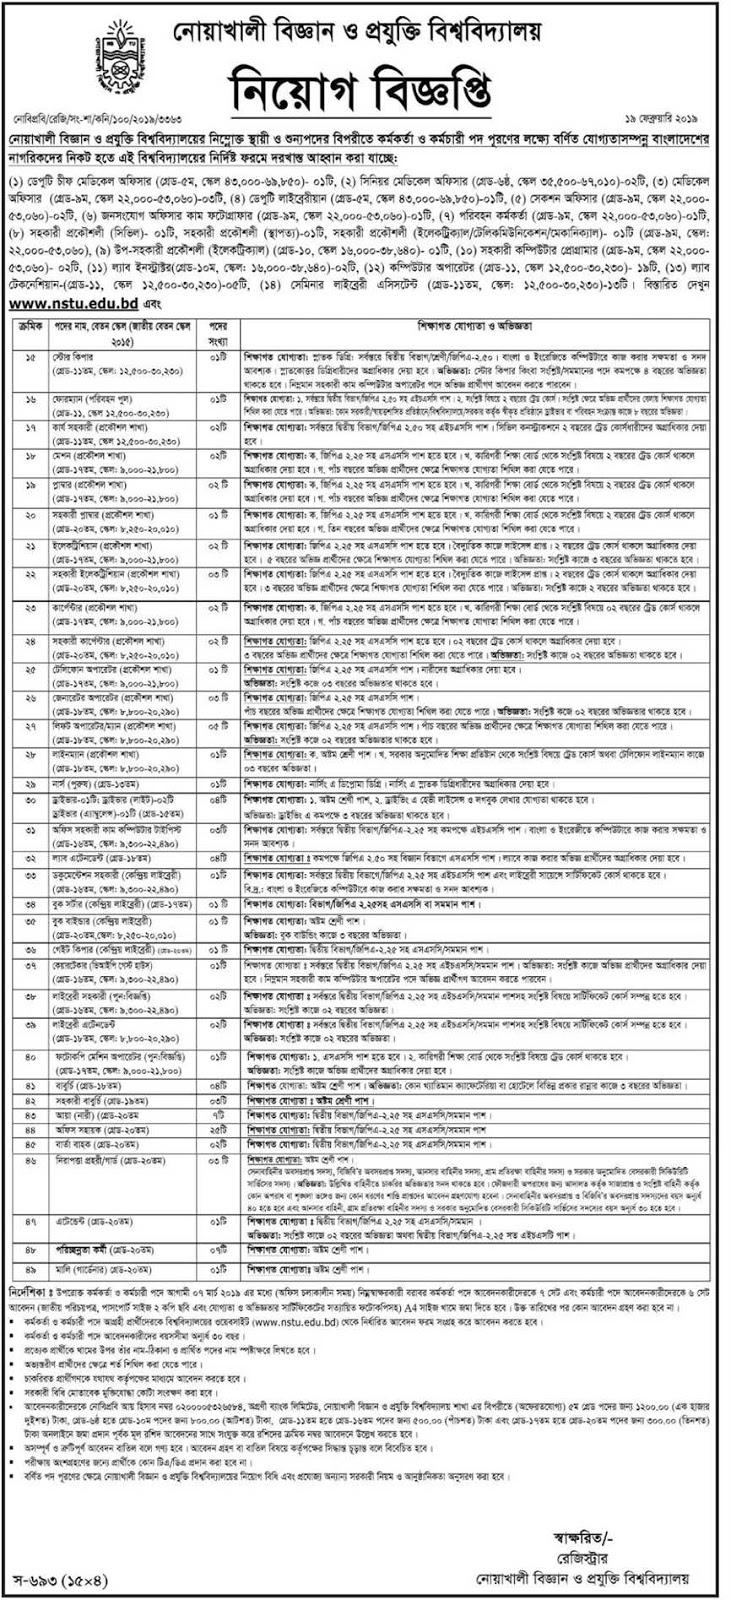 Noakhali Science and Technology University (NSTU) Job Circular 2019